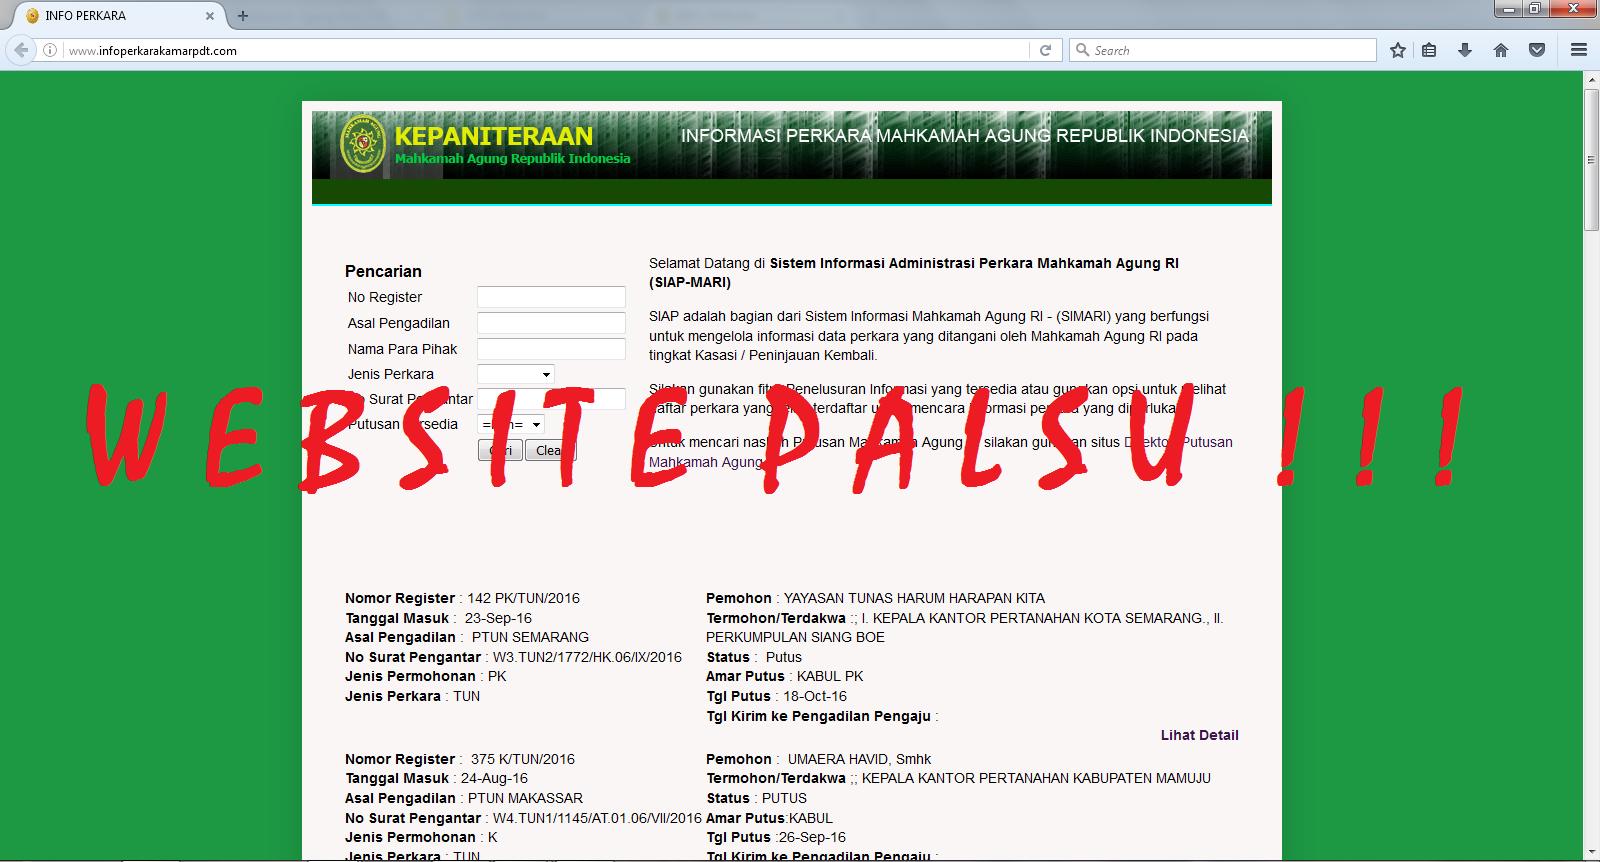 WASPADA TERHADAP WEBSITE